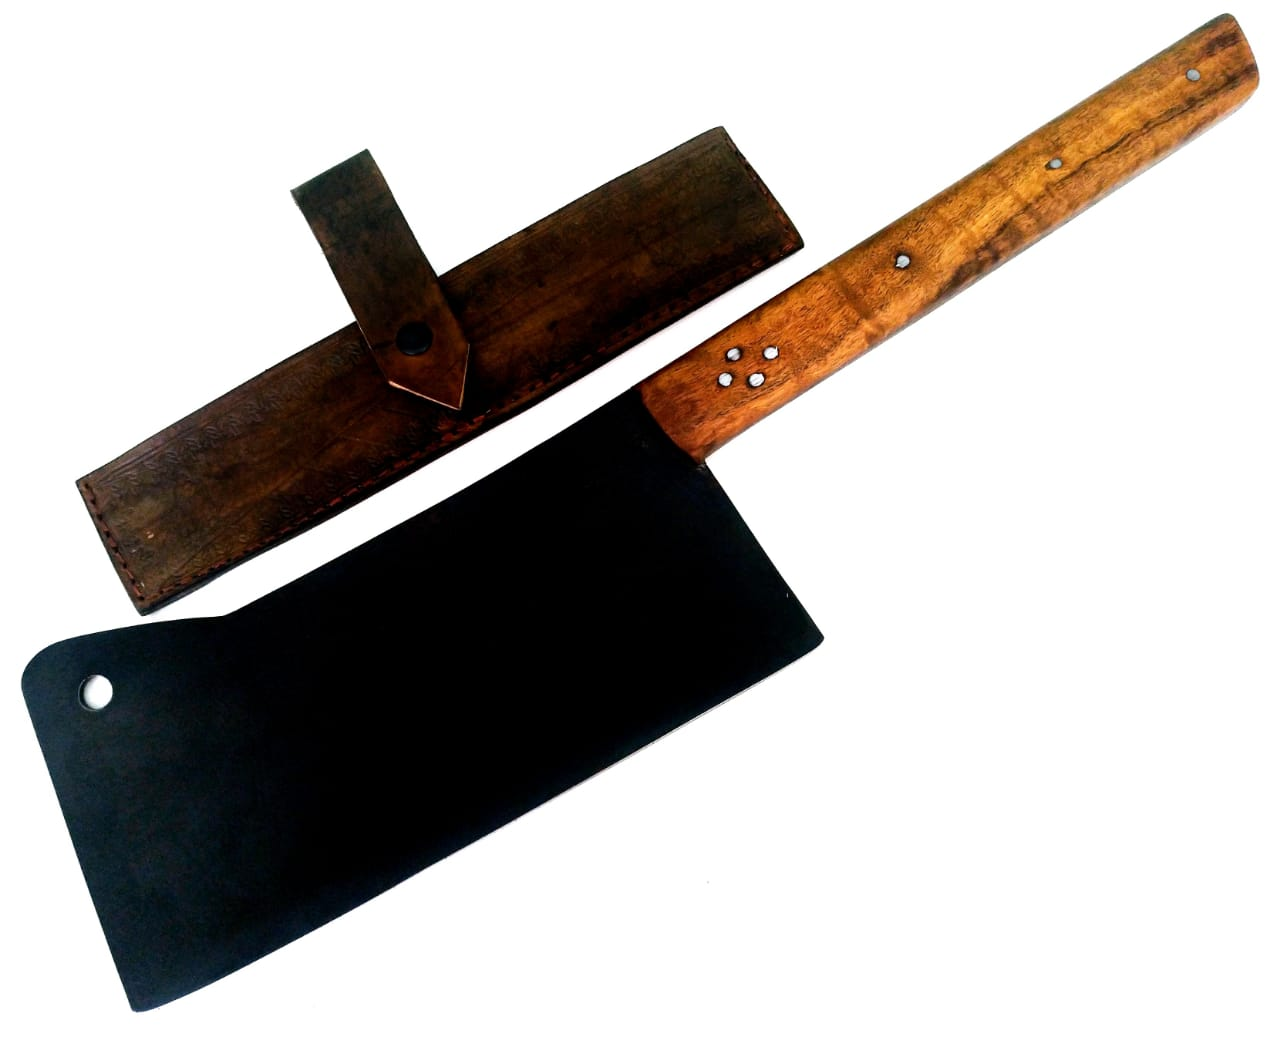 Réplica de cutelo inglês artesanal forjado full tang